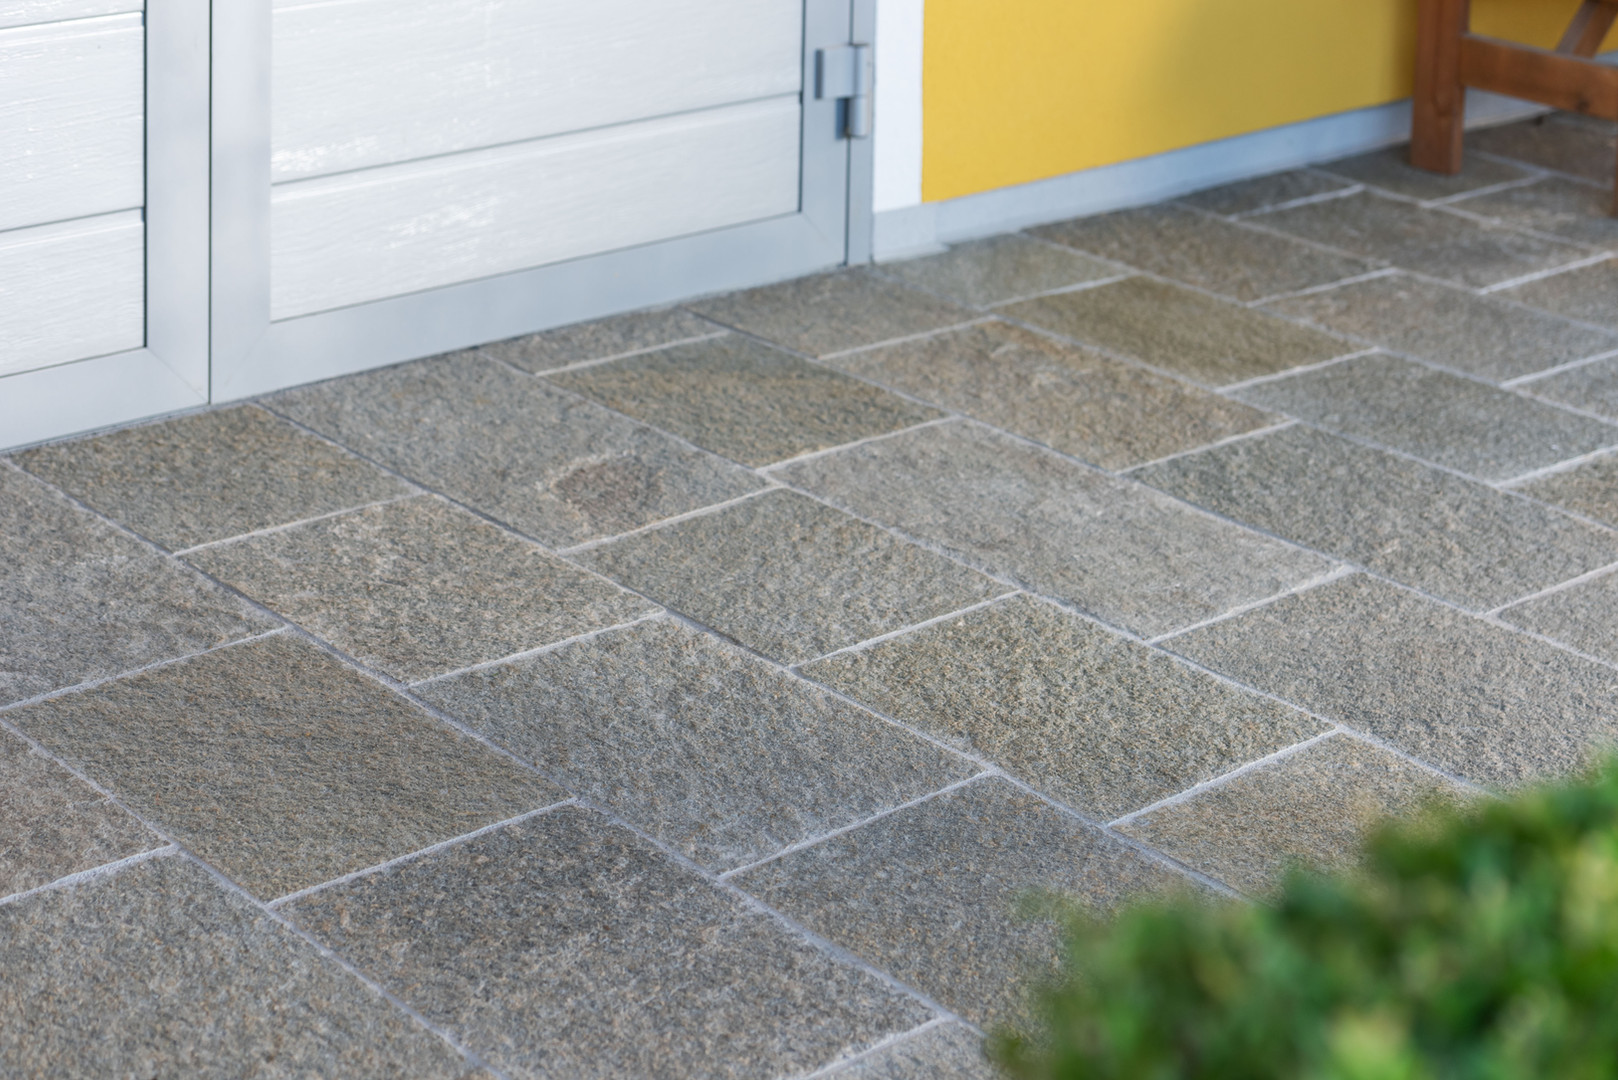 Privathaus Südsteiermark (Material: Luserna Gneis, Oberfläche: spaltrau, Kanten: gesägt, Farbe: gelbmix)